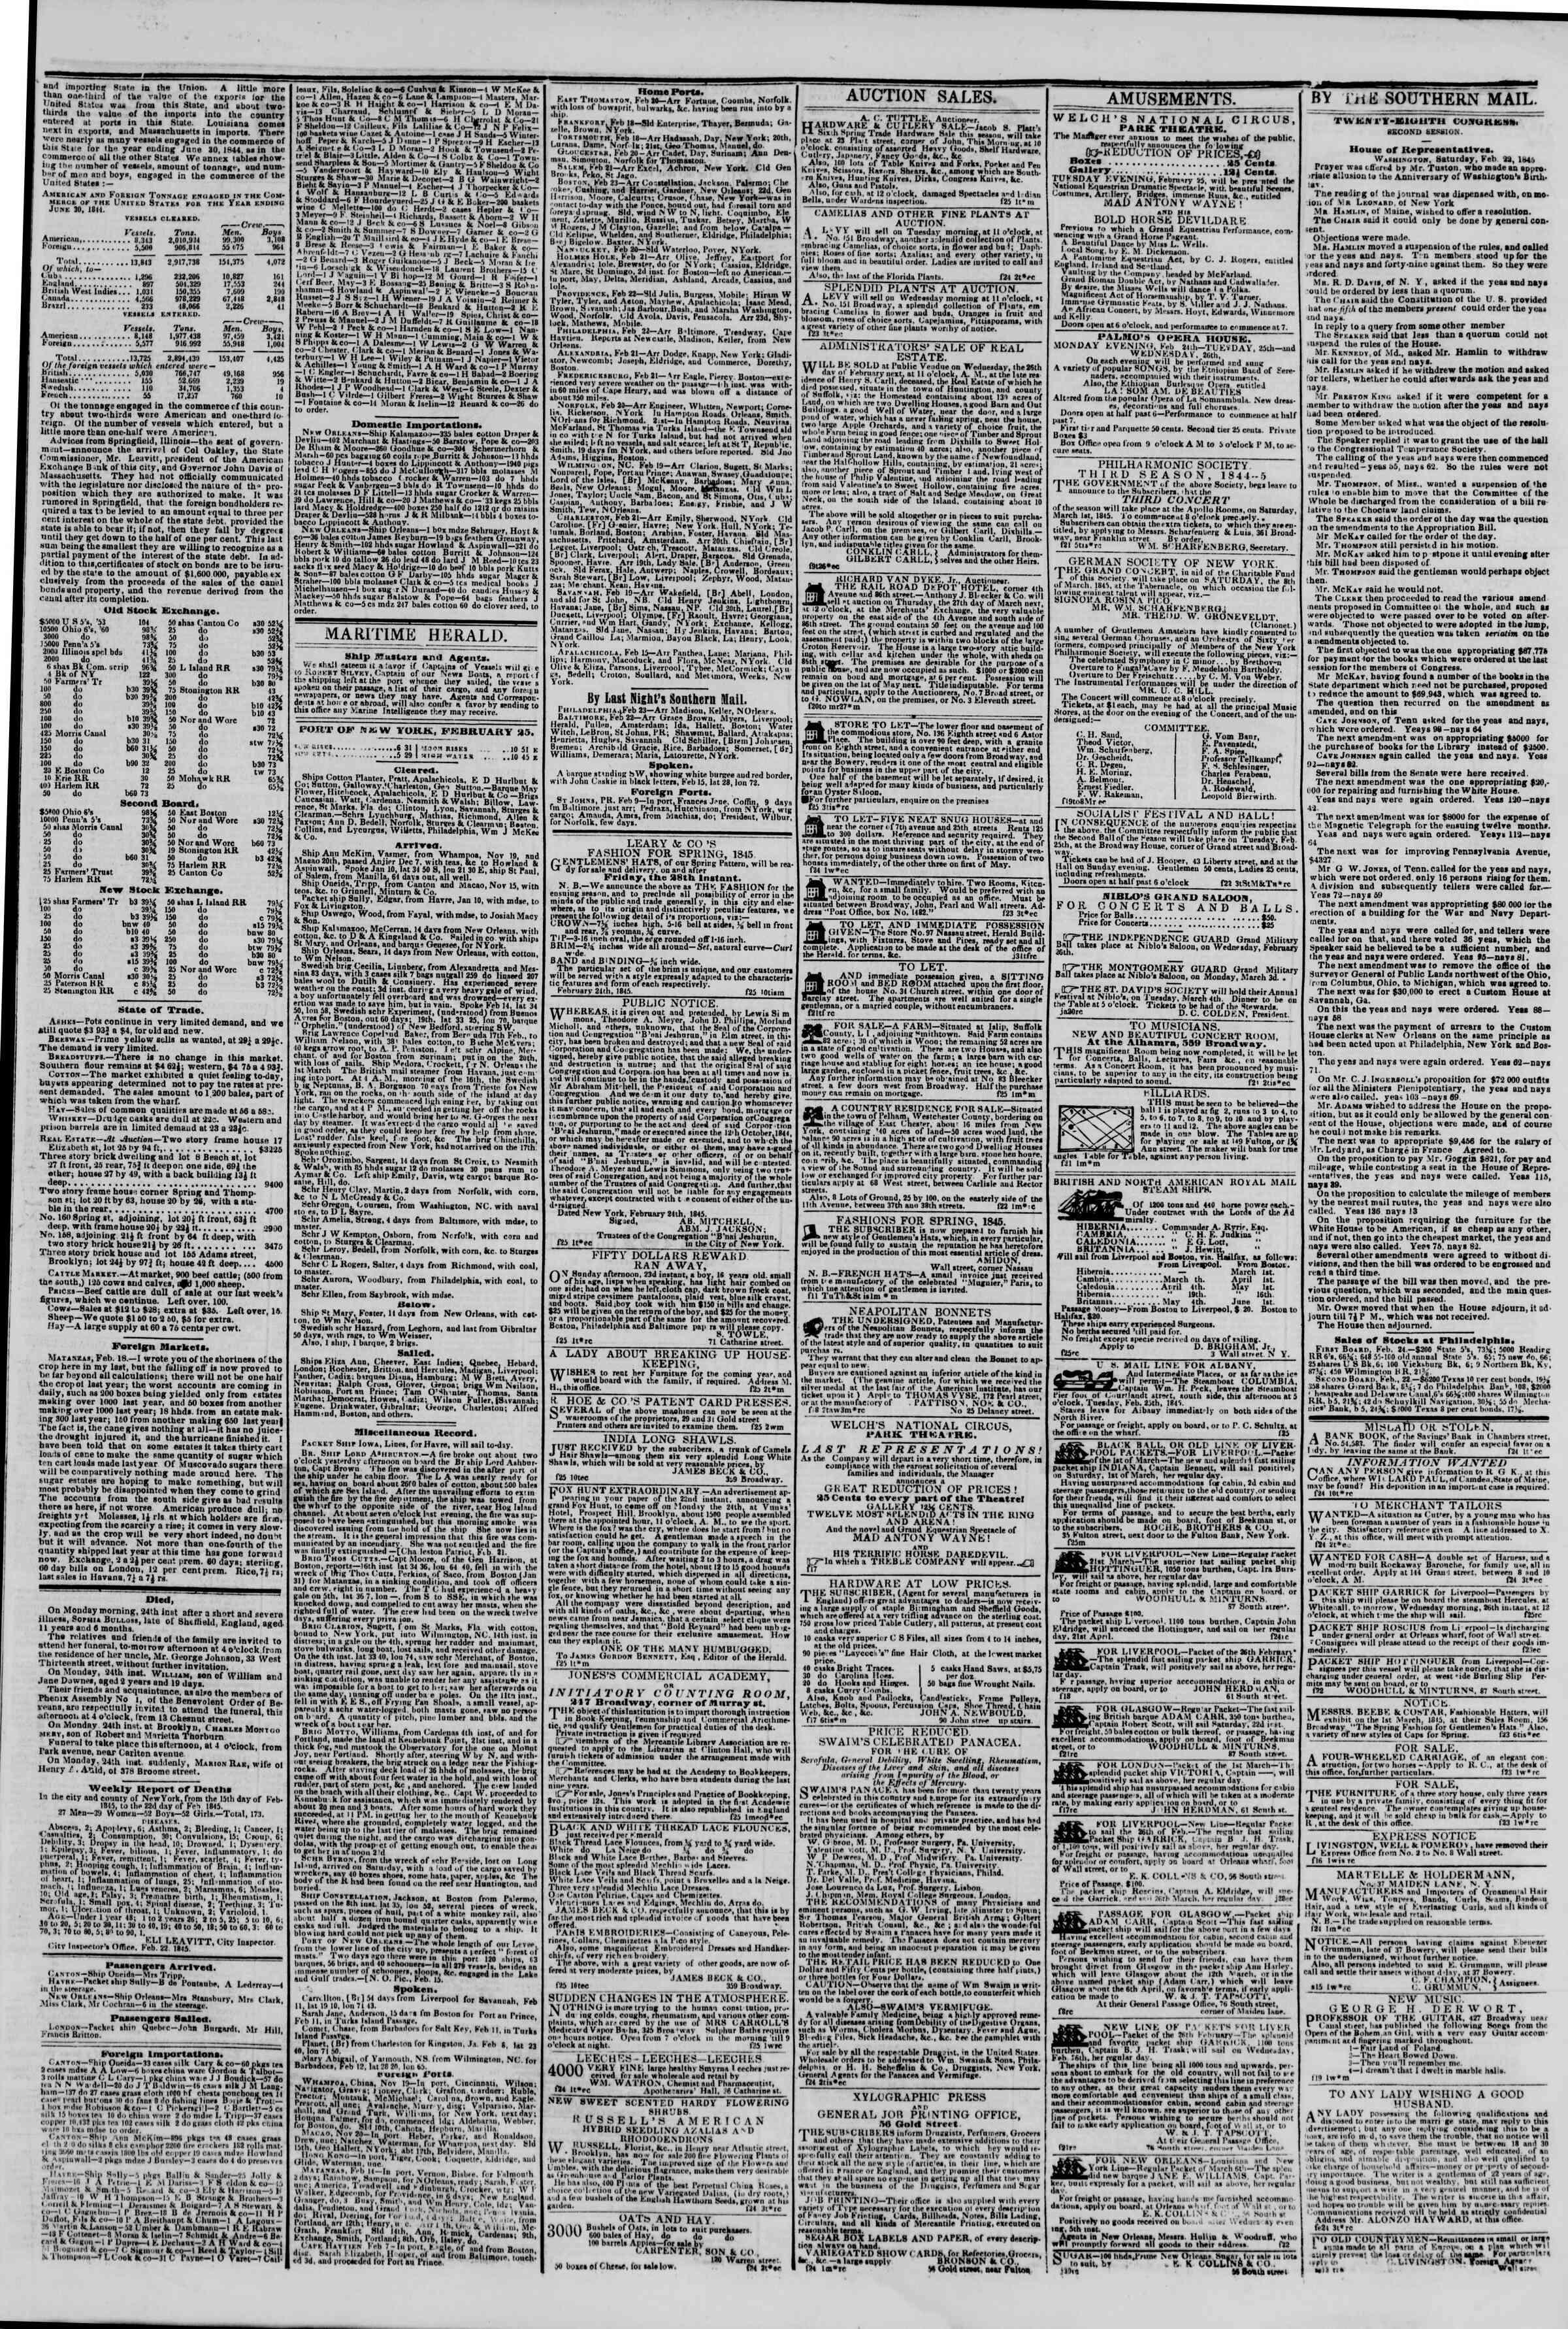 February 25, 1845 Tarihli The New York Herald Gazetesi Sayfa 3